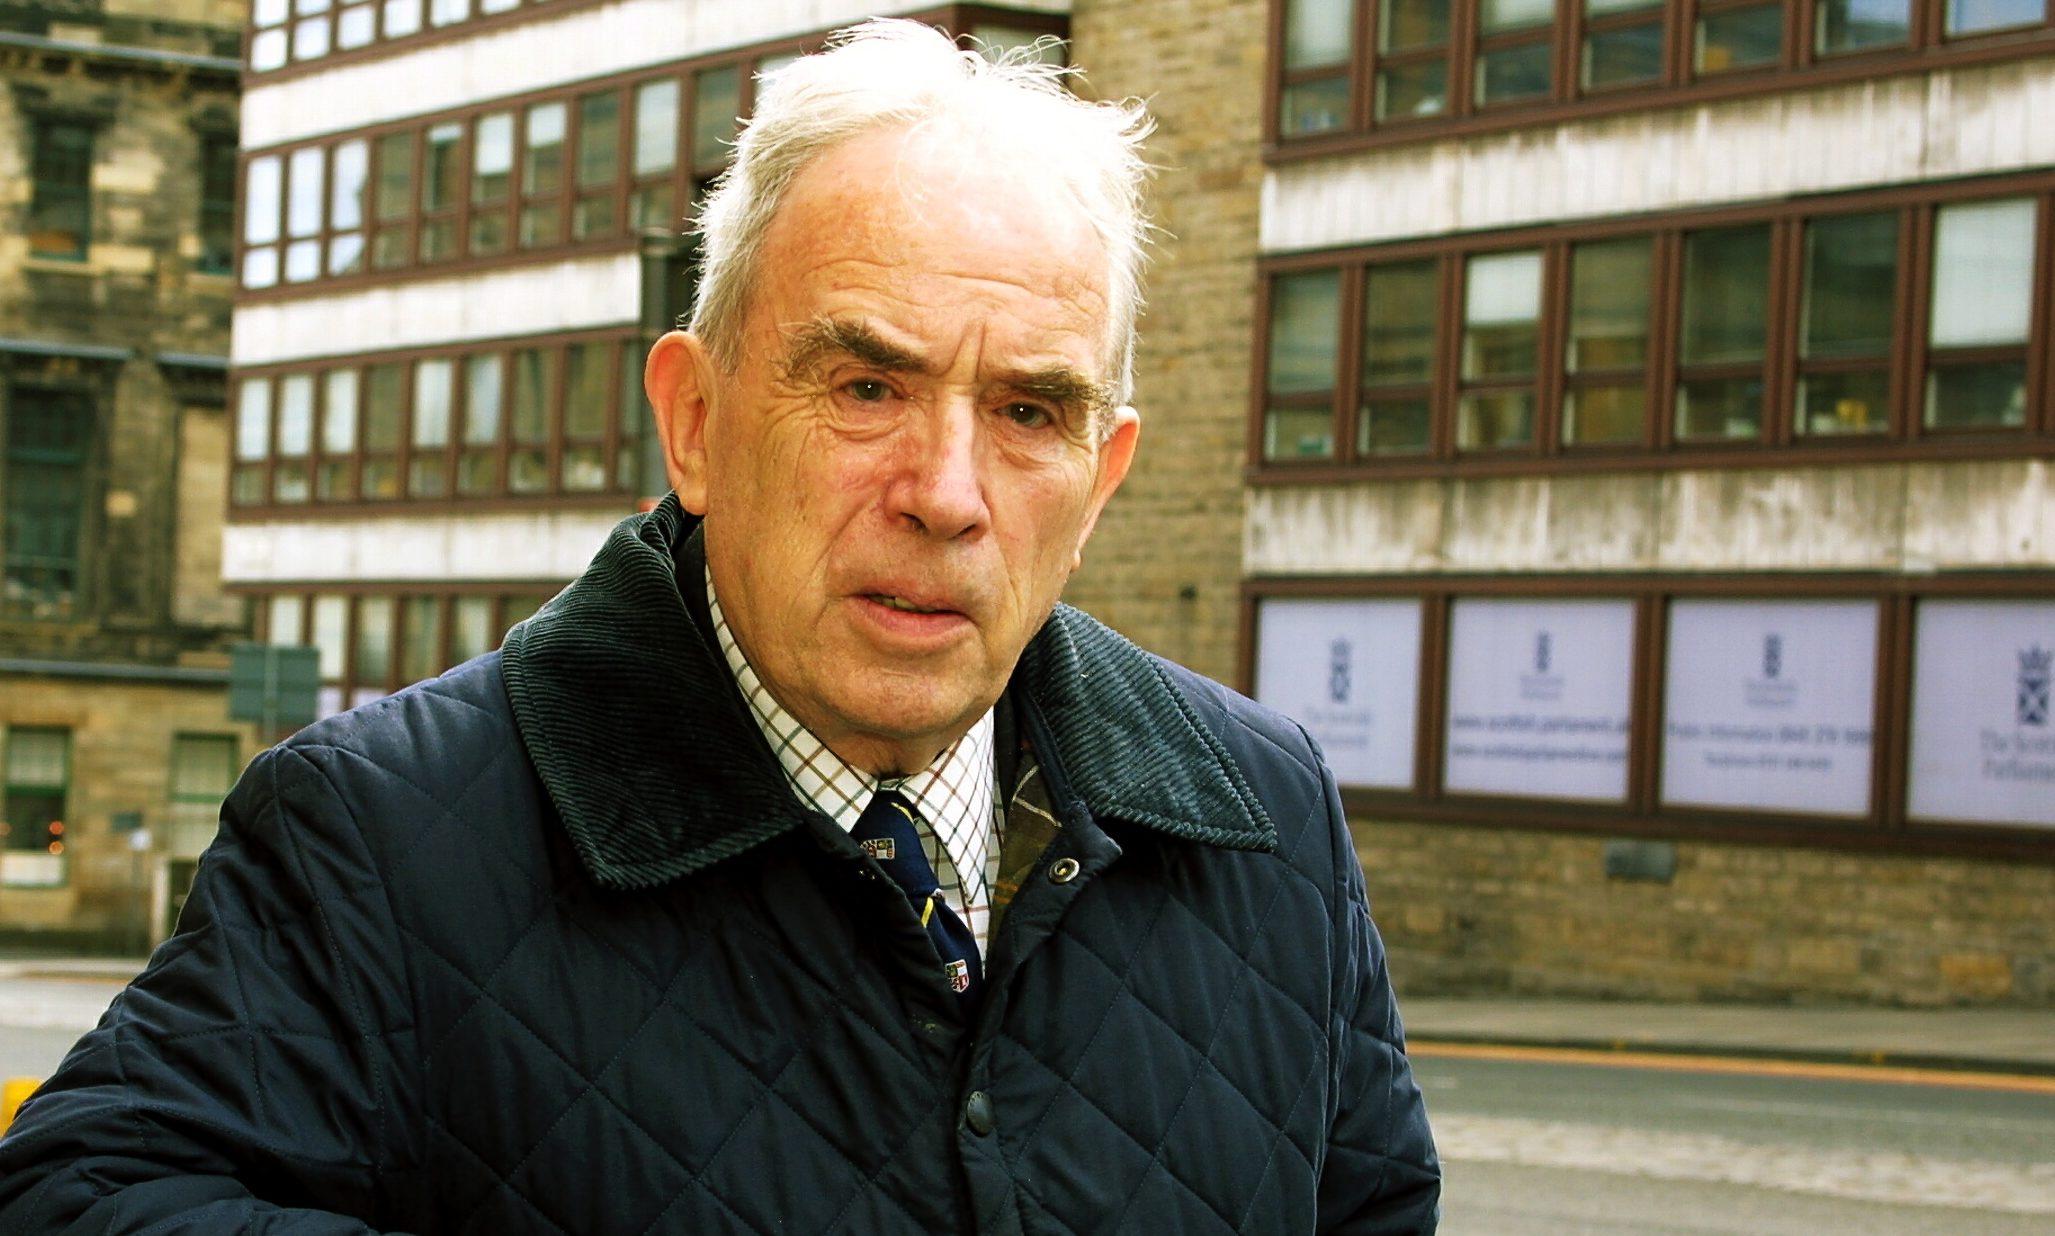 Ian Hamilton, the mastermind behind the 1950 Westminster Abbey raid